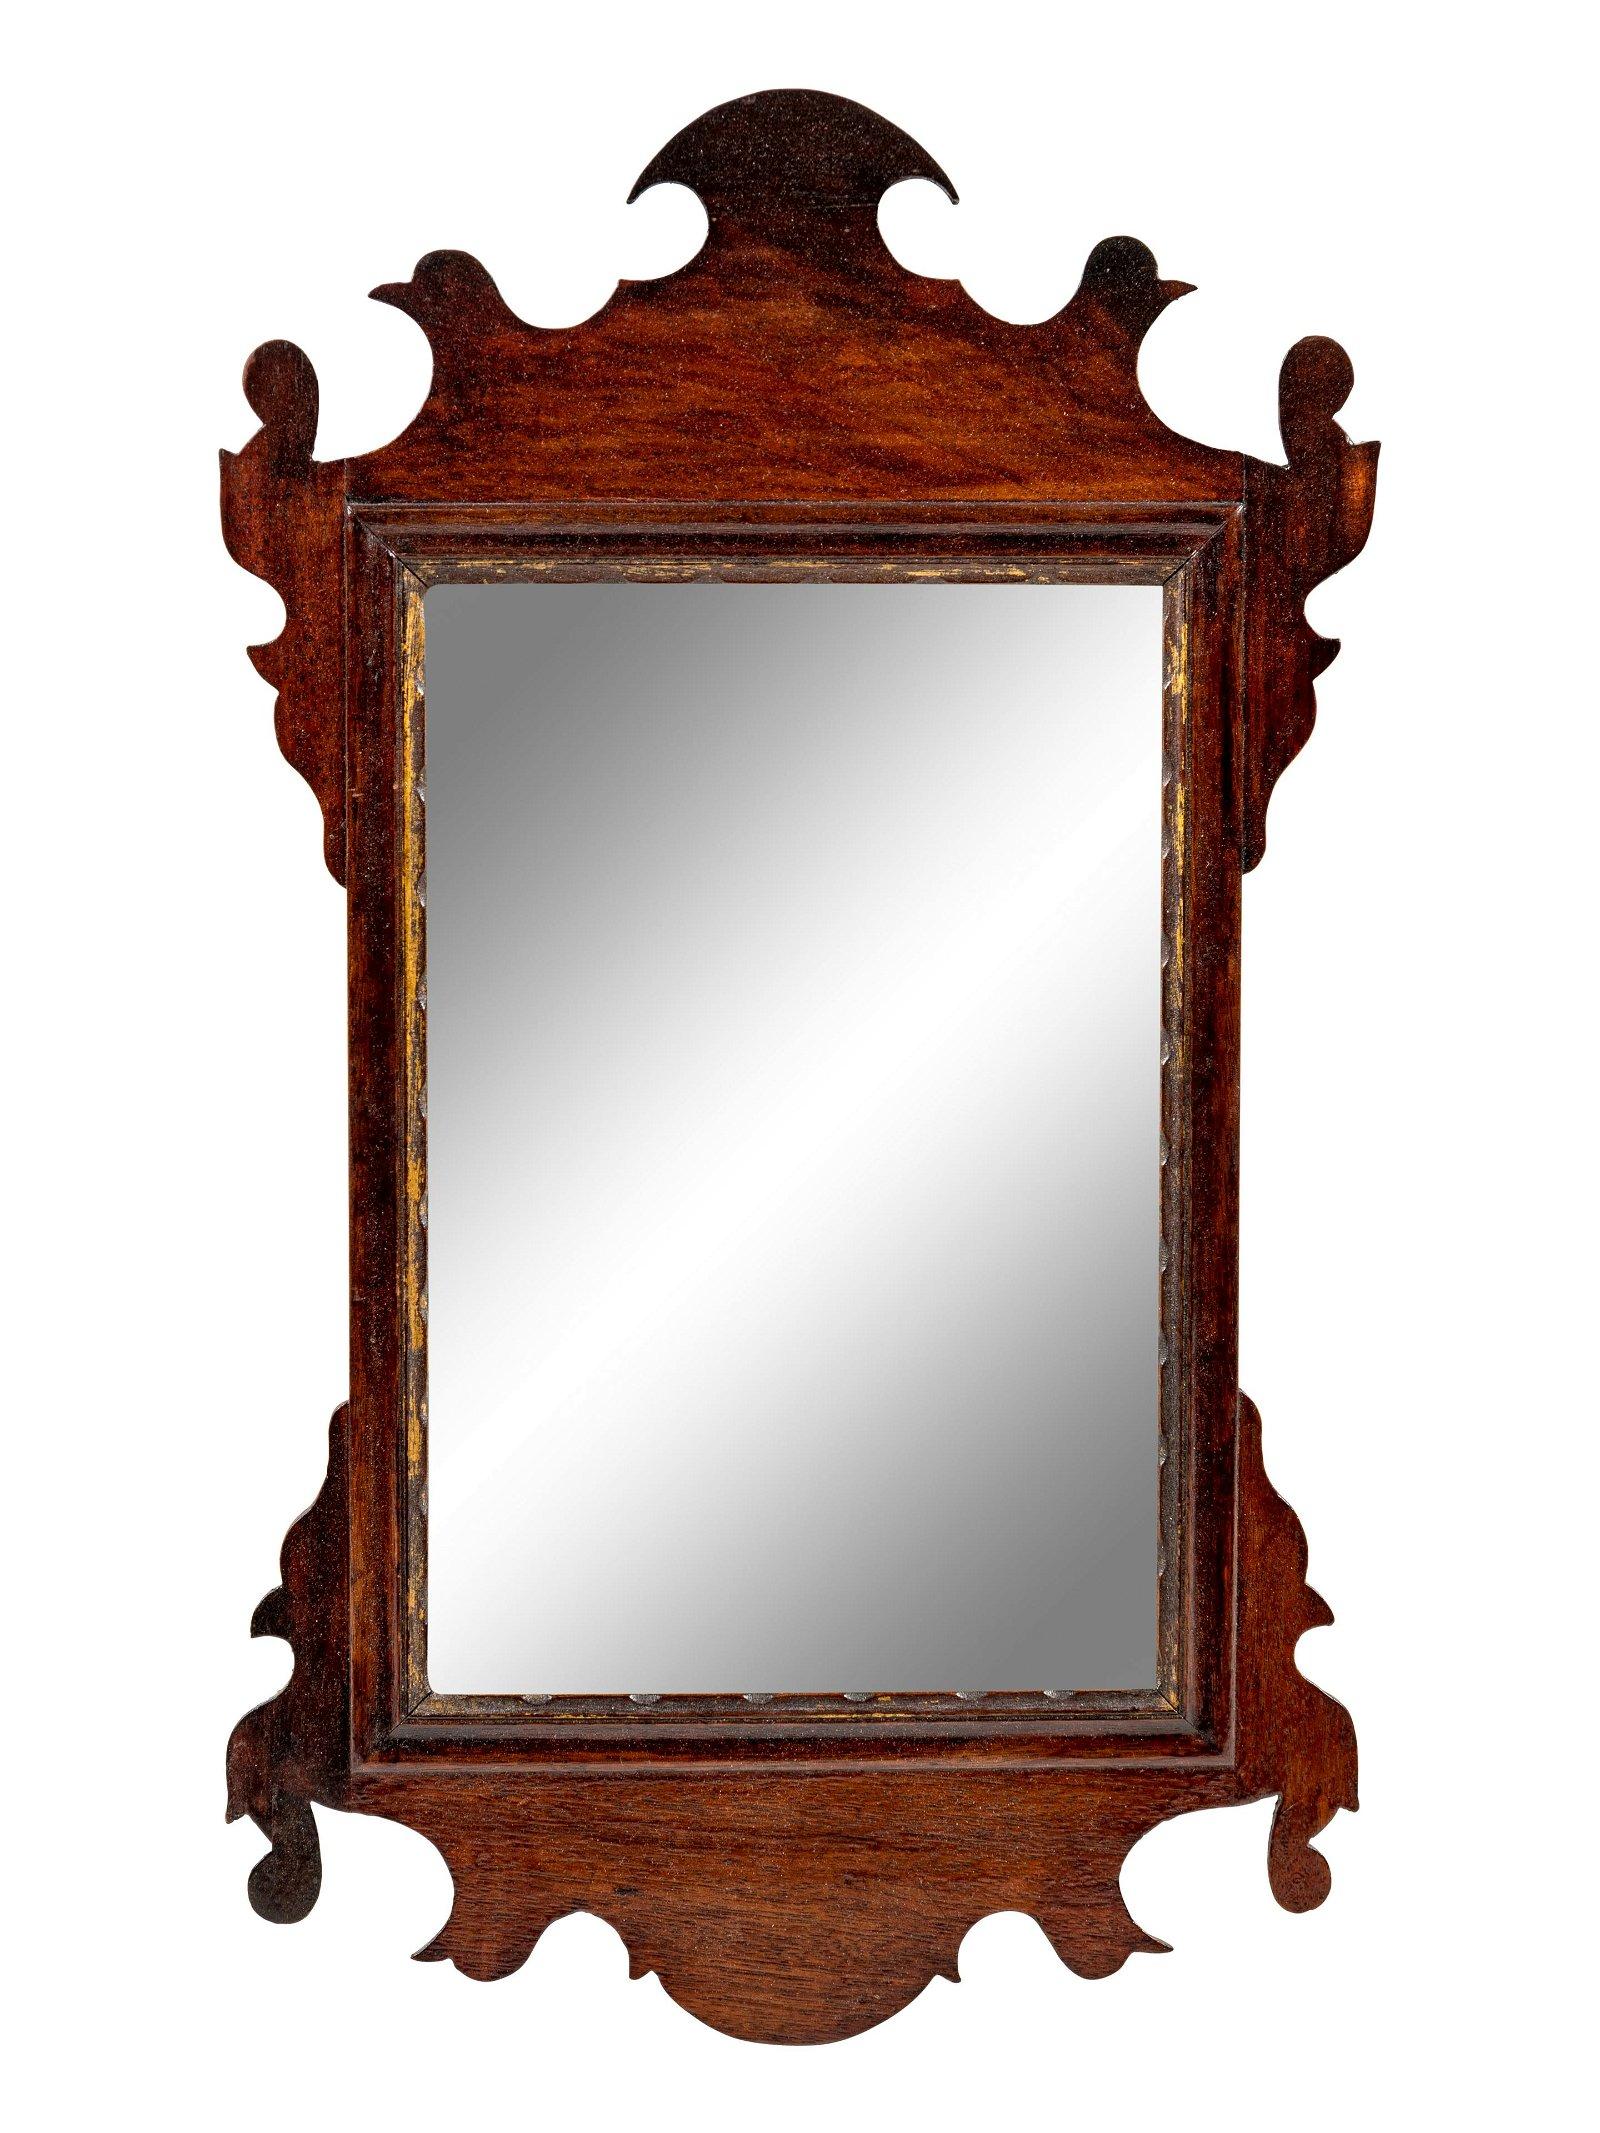 A George III Carved Mahogany Mirror